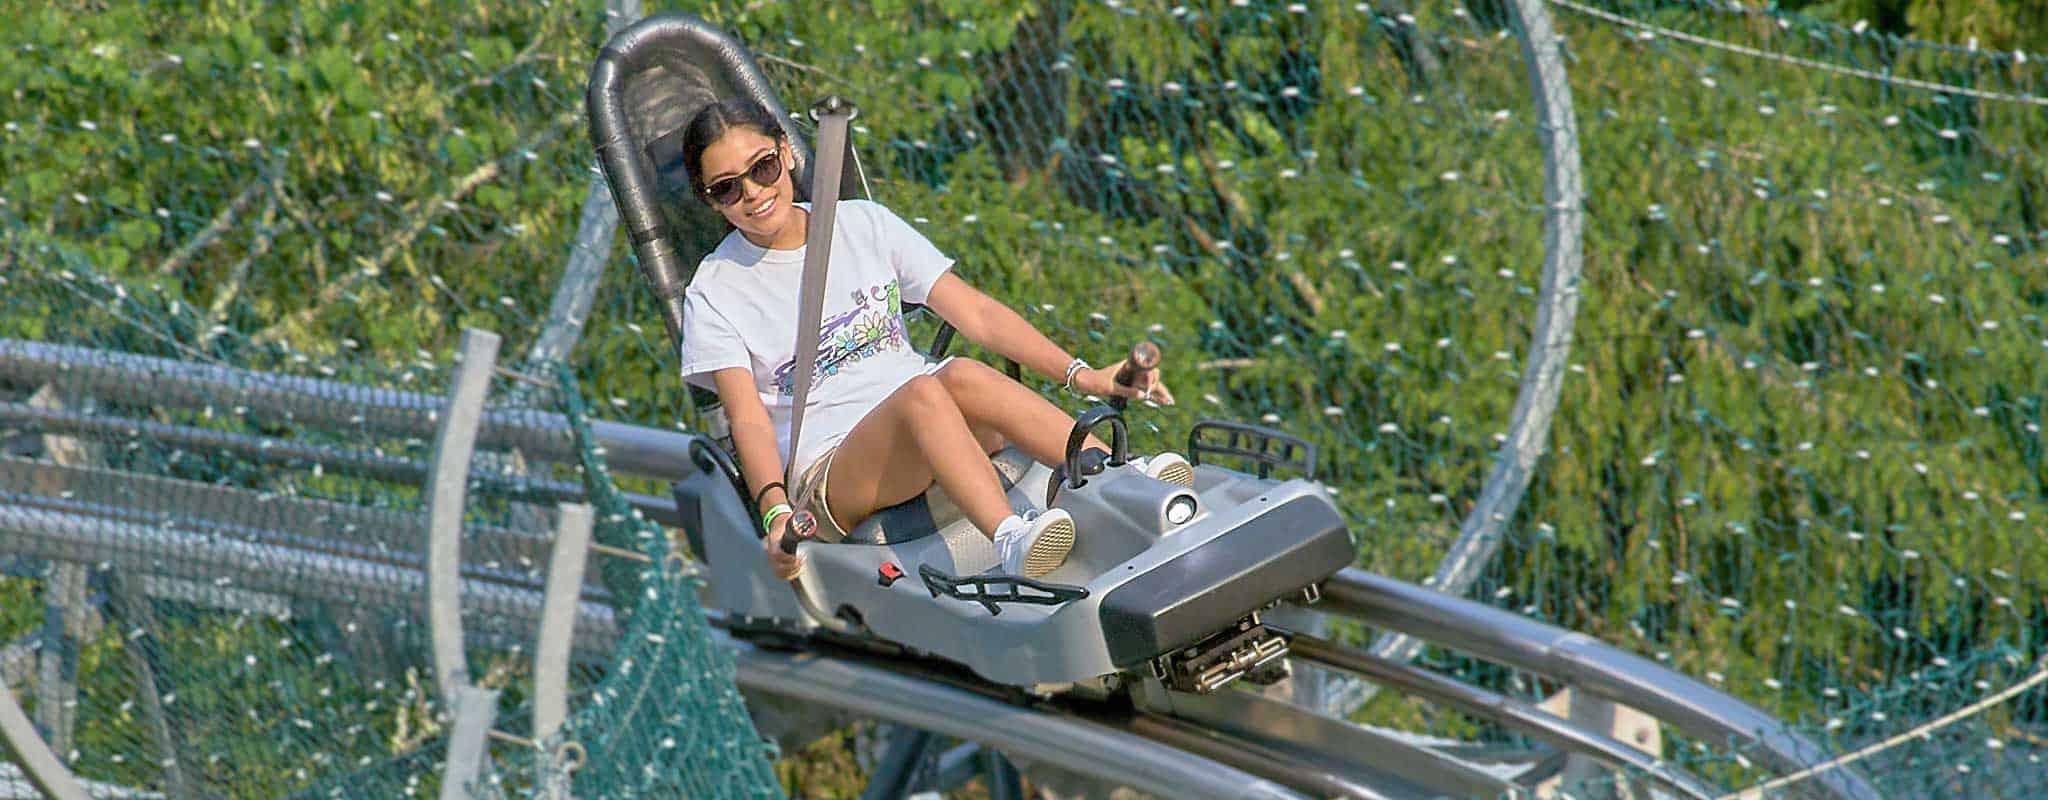 Couple riding Alpine Coaster